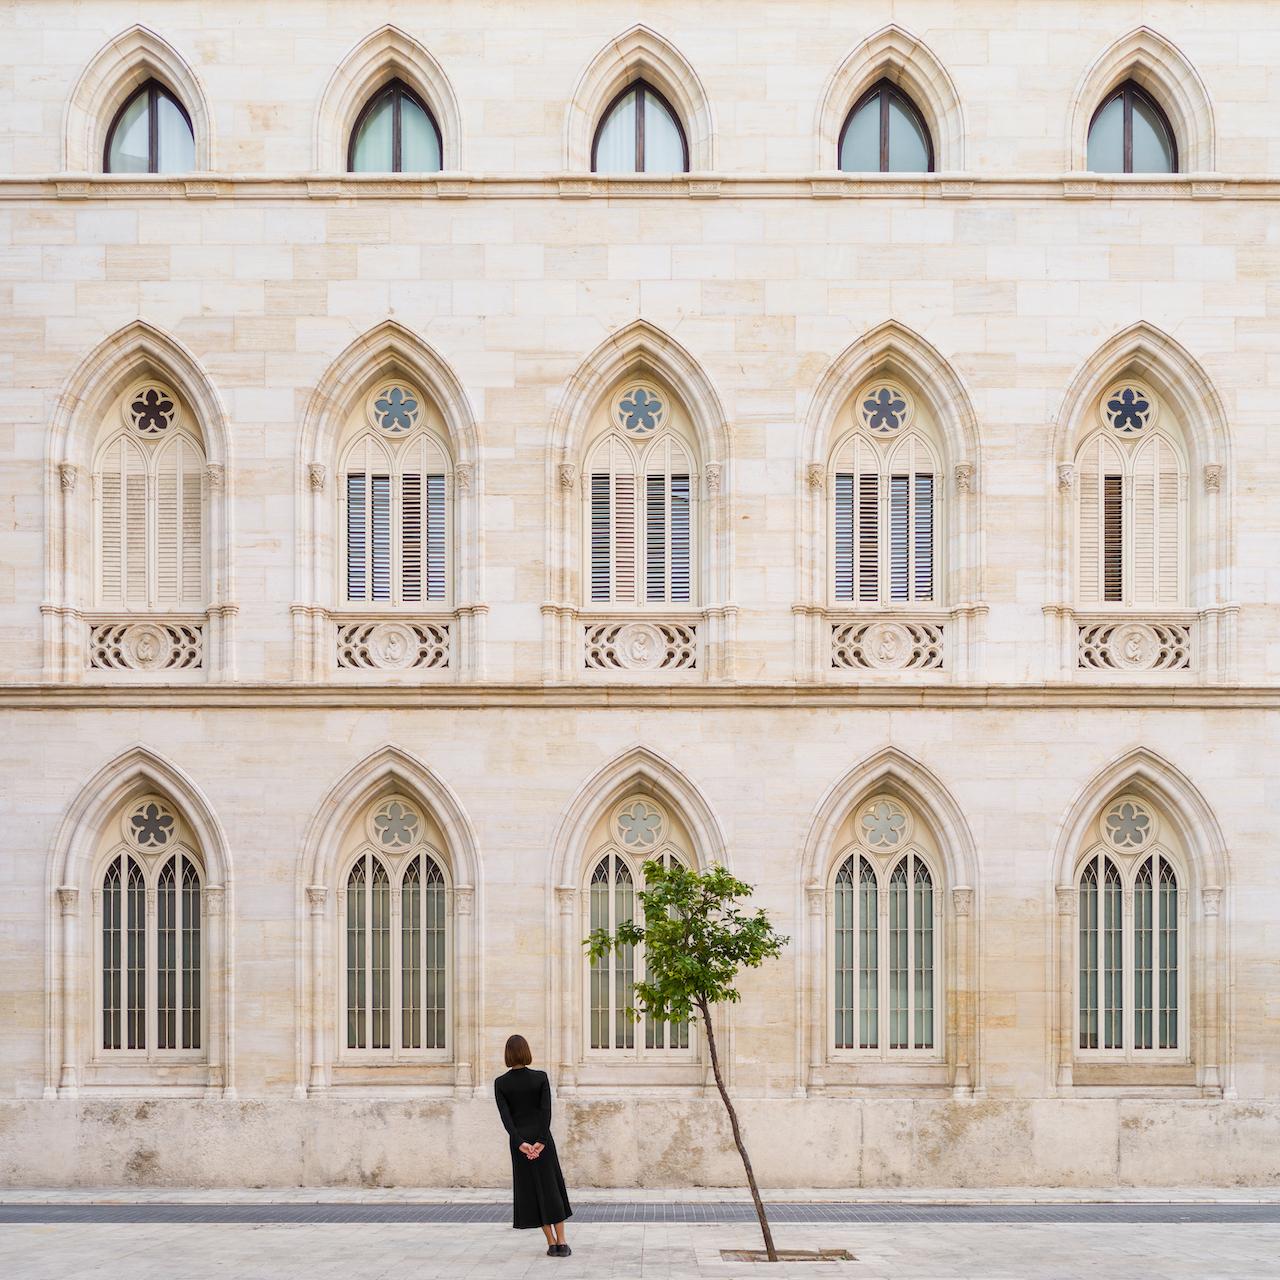 Annandaniel Anniset DrCuerda Anna Devís Daniel Rueda Curiocities Valencia Creative Fine Art Architecture photography Leaning Curve